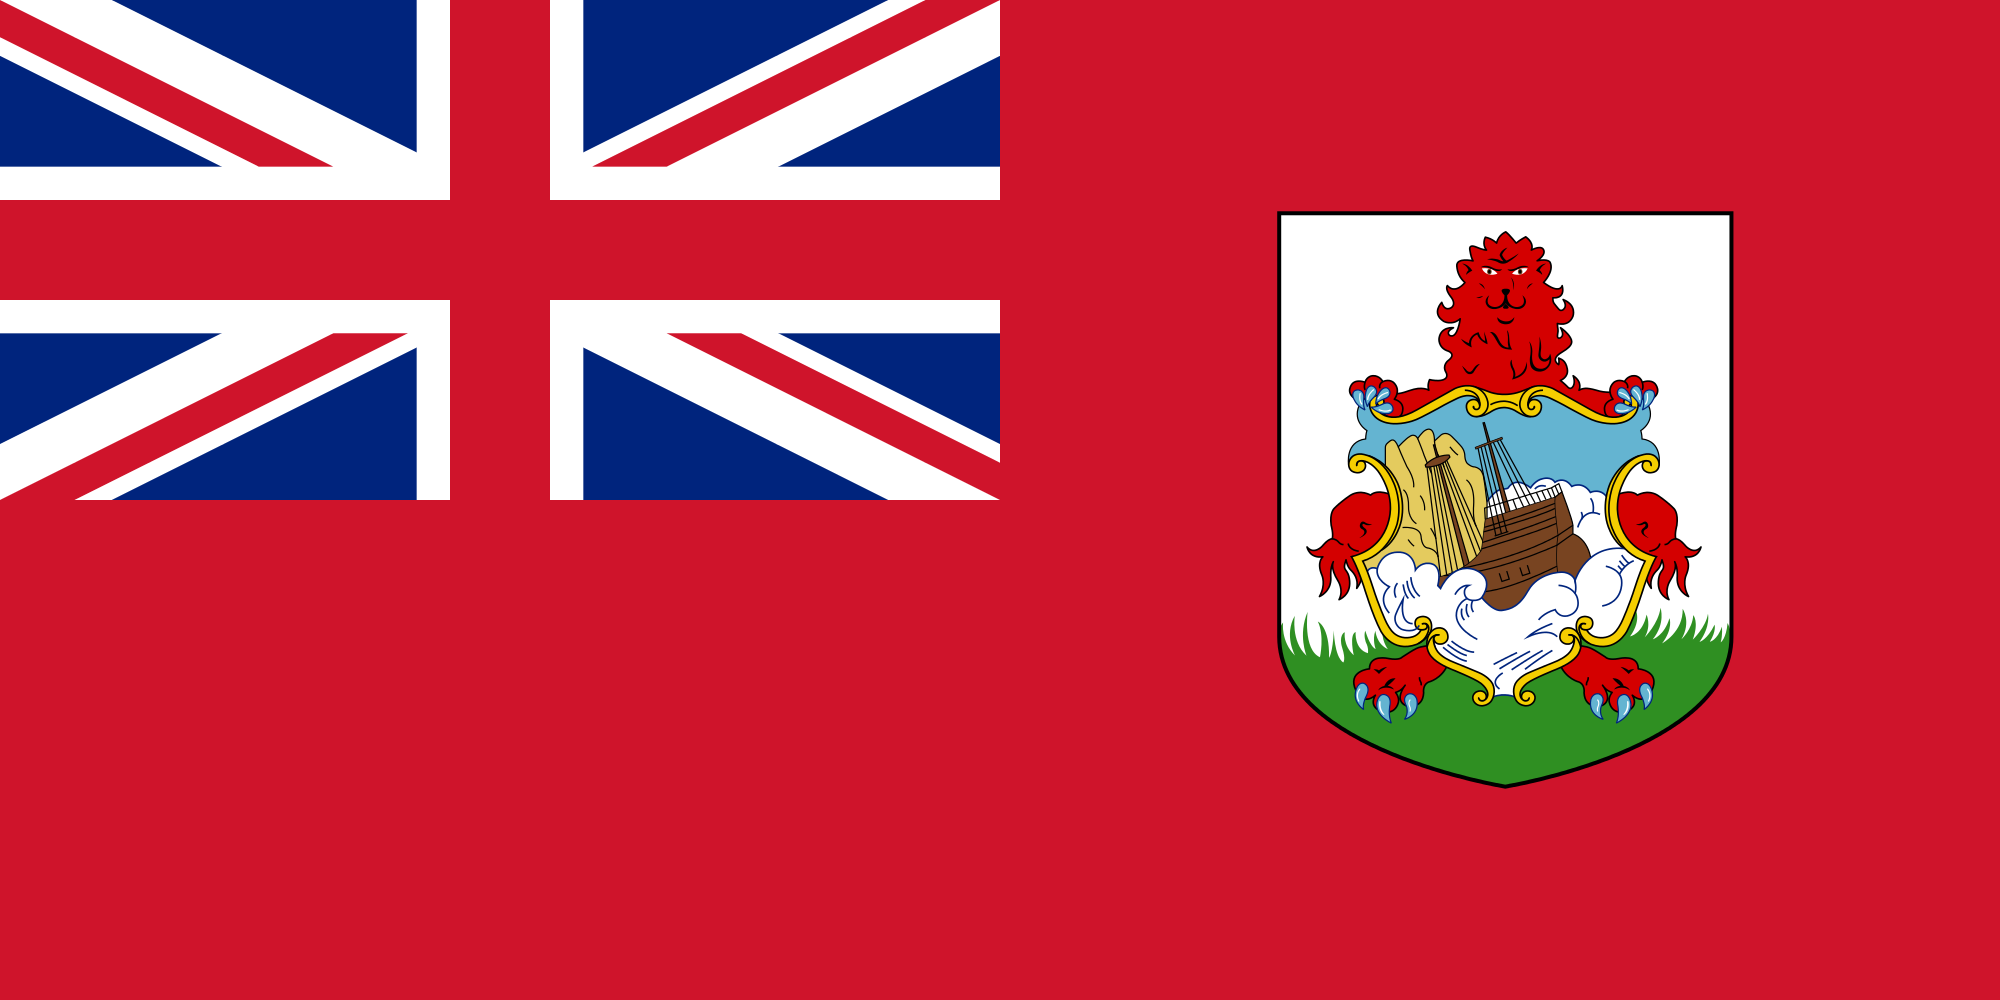 Bermuda, paese, emblema, logo, simbolo - Sfondi HD - Professor-falken.com